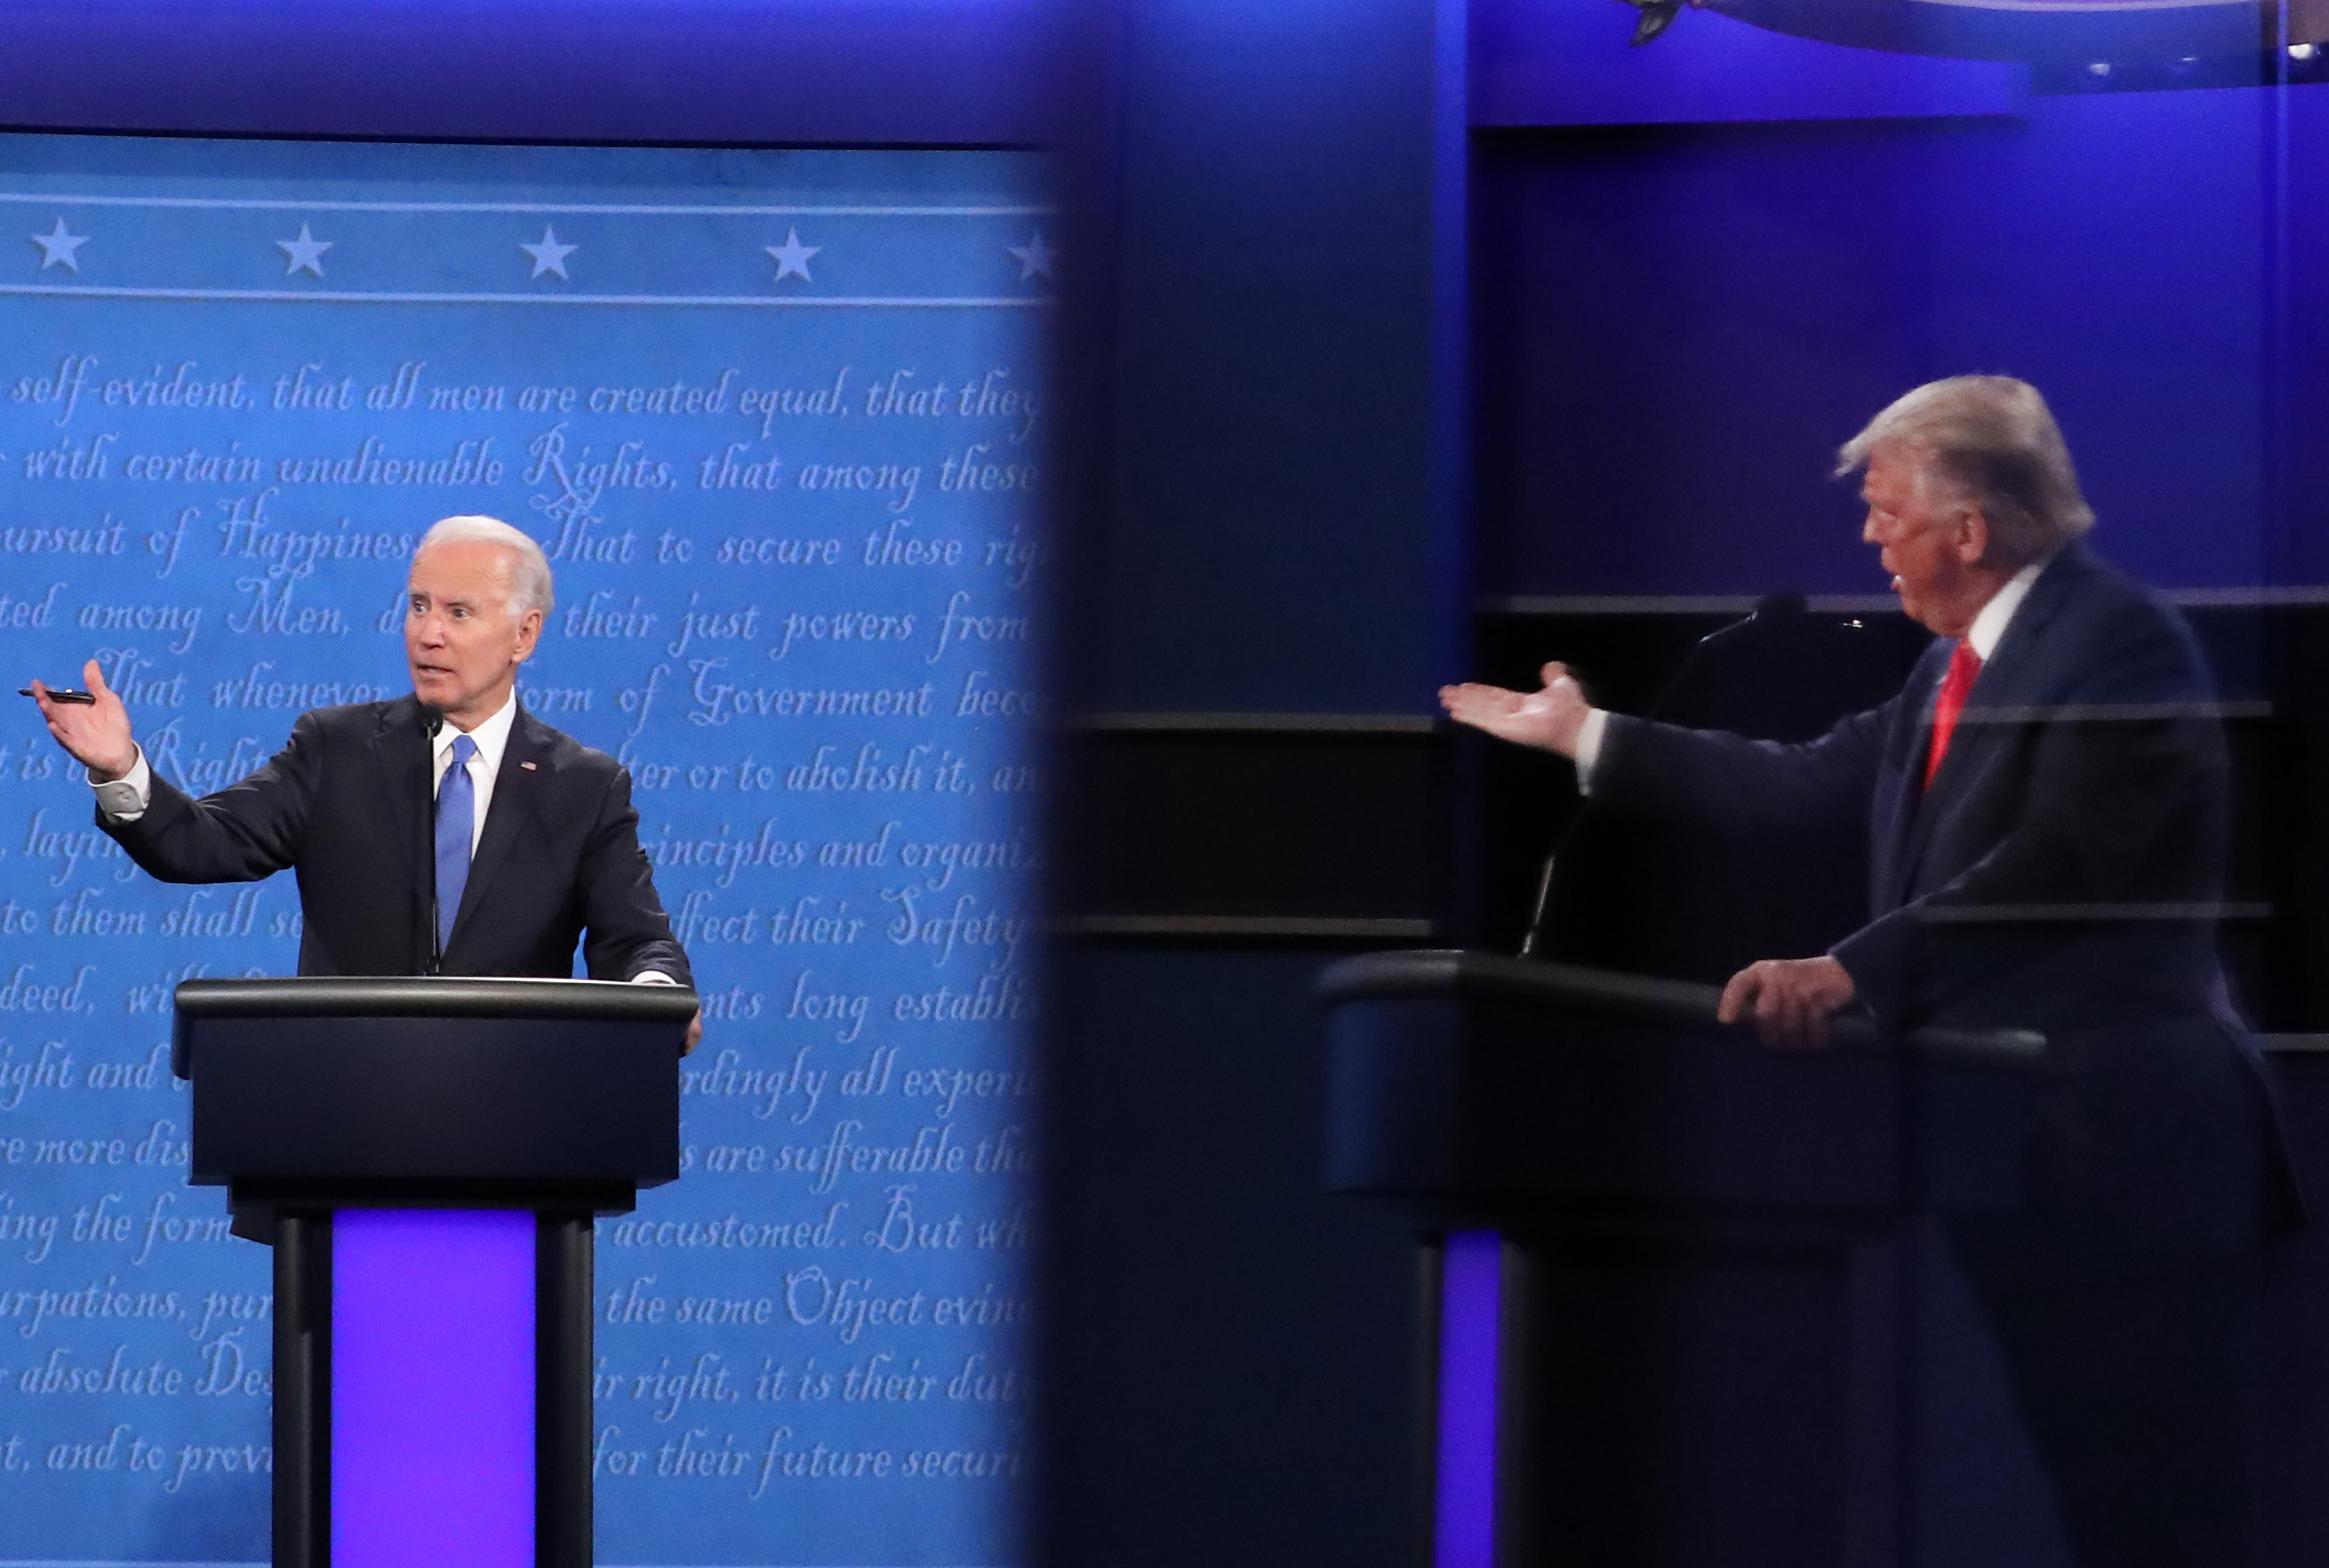 Did Trump say wind turbines cause cancer like Biden claimed in presidential debate?